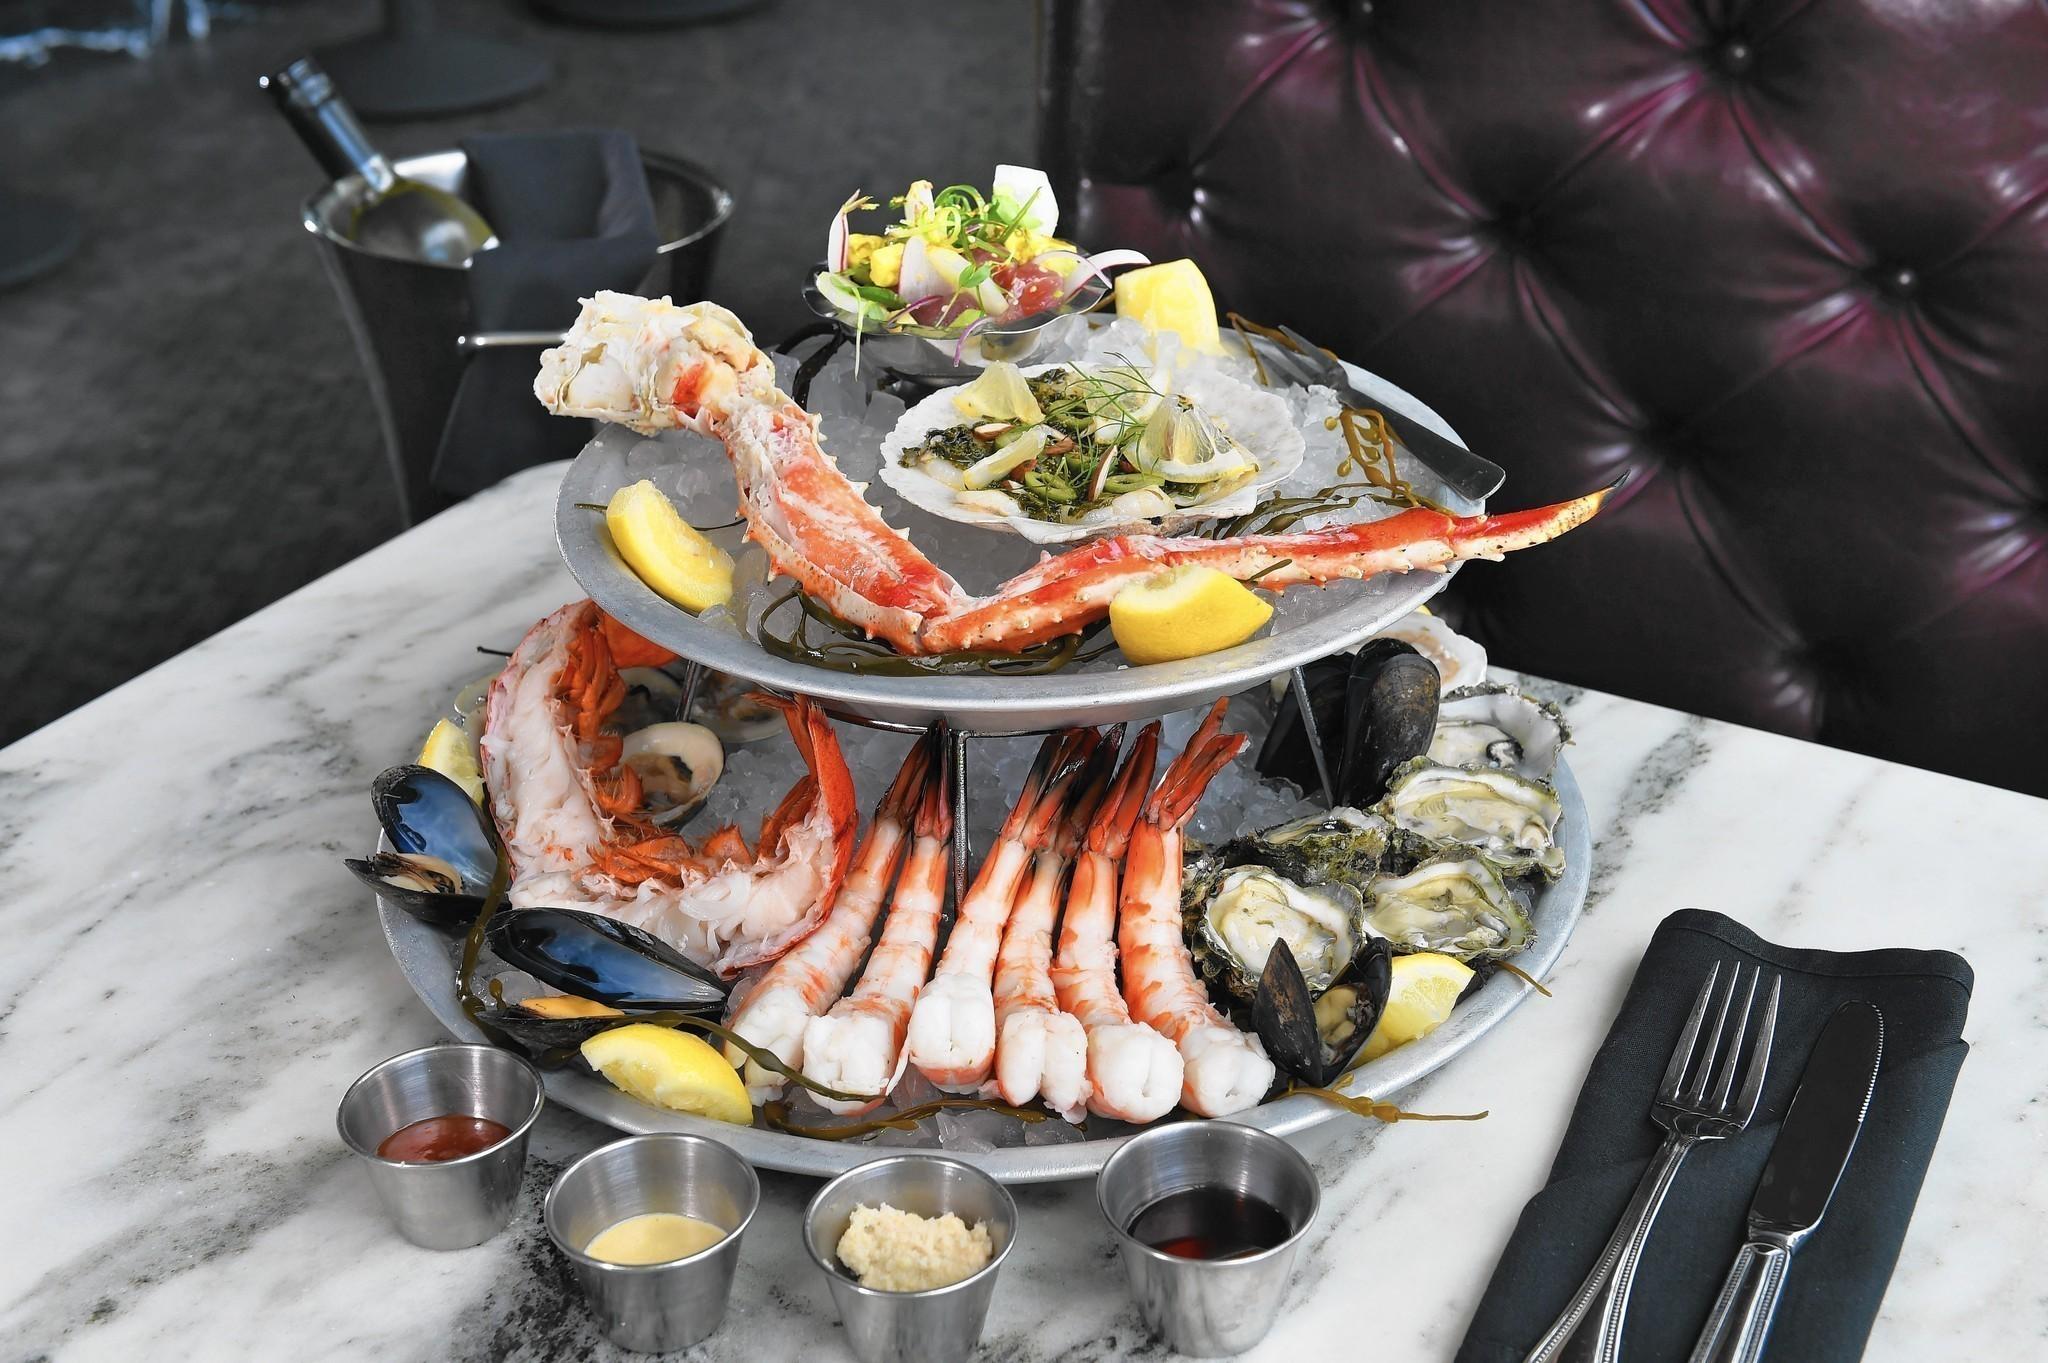 Boca Raton Shopping >> Loch Bar opening Boca Raton location - Baltimore Sun